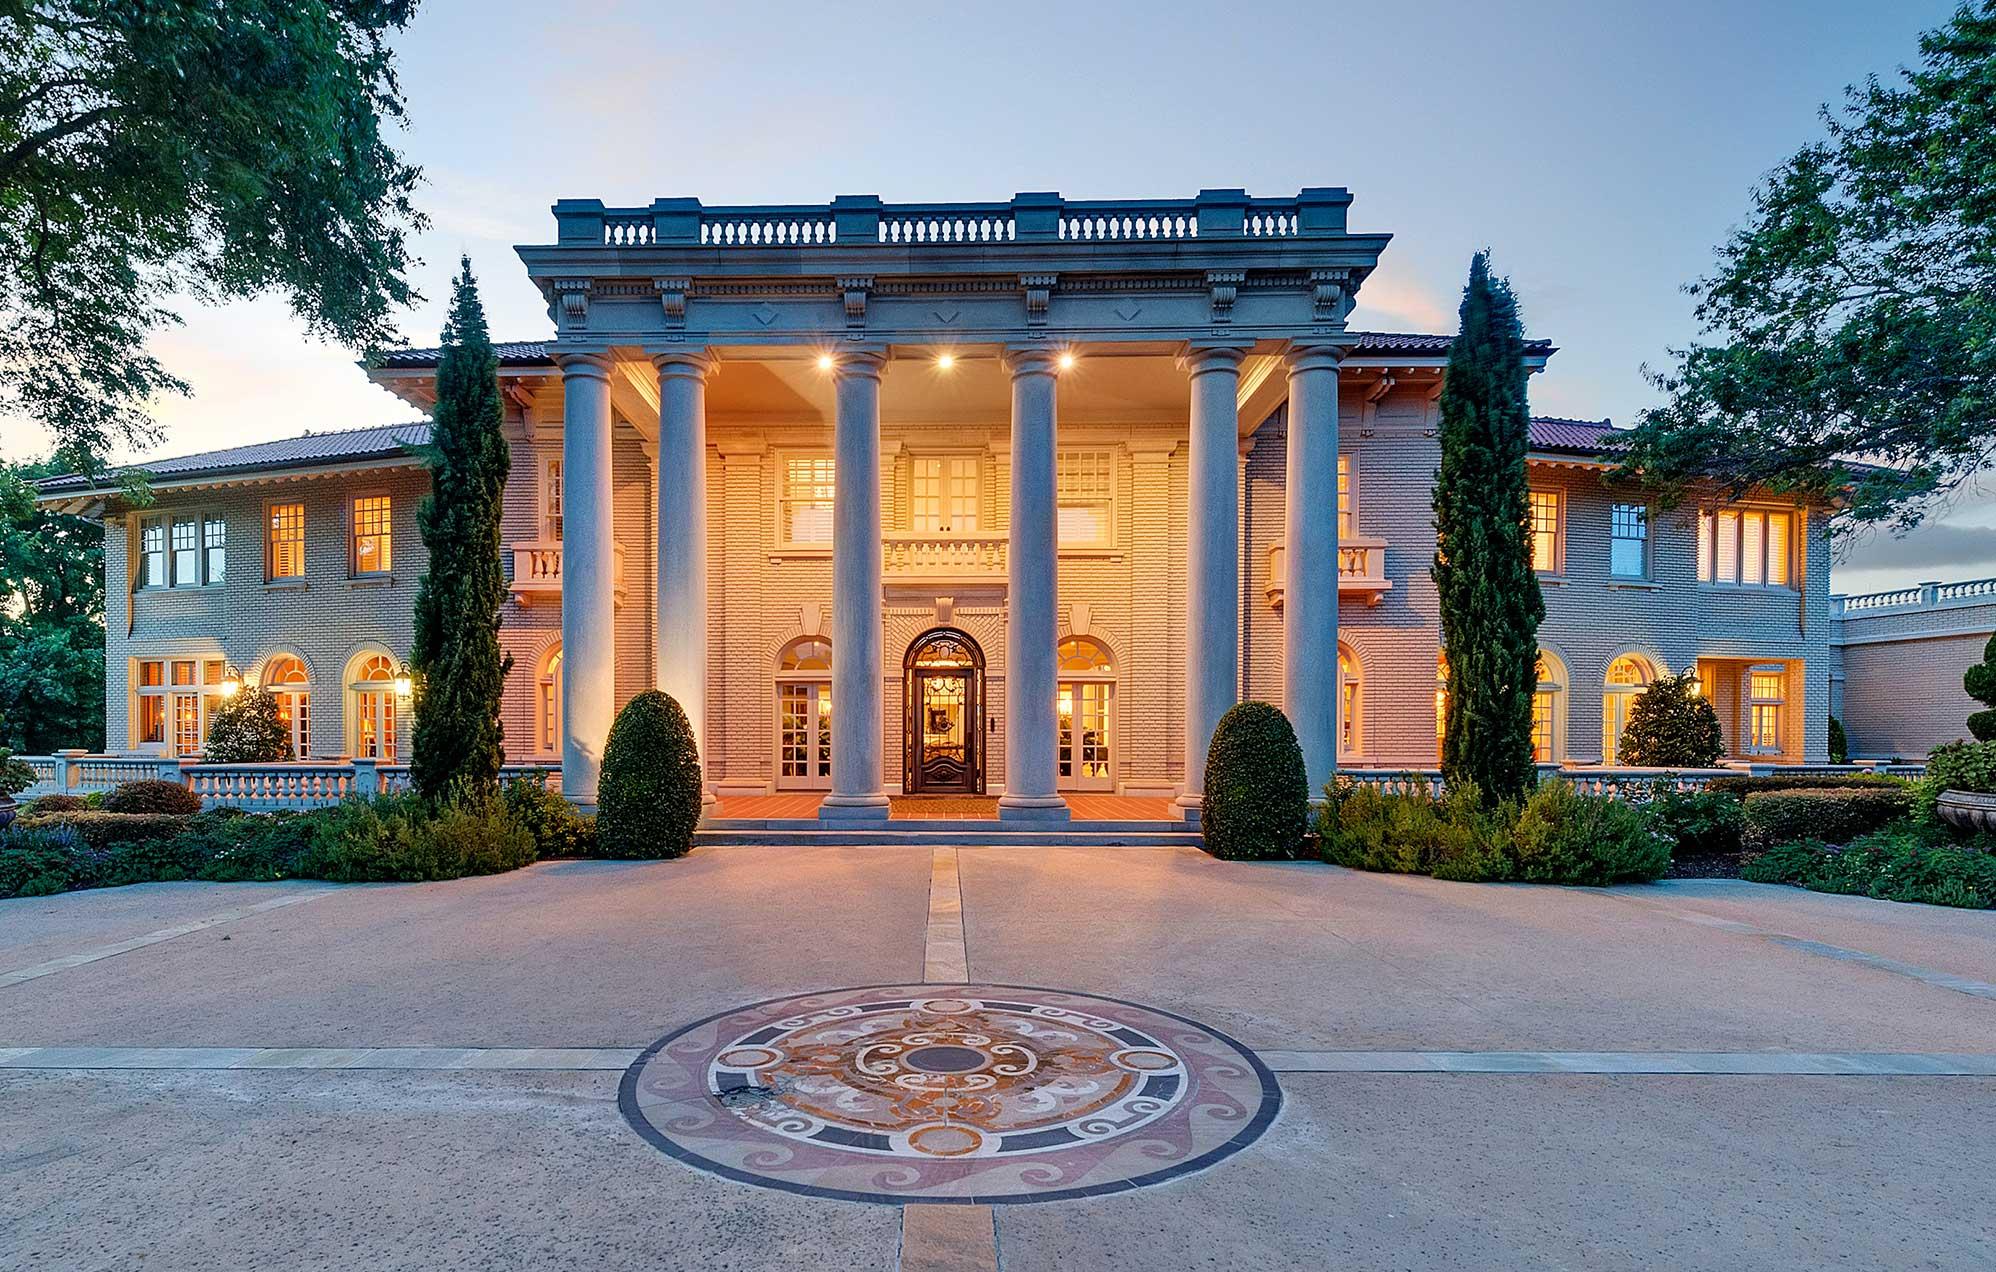 Admirable Baldridge House A Luxury Home For Sale In Fort Worth Interior Design Ideas Tzicisoteloinfo